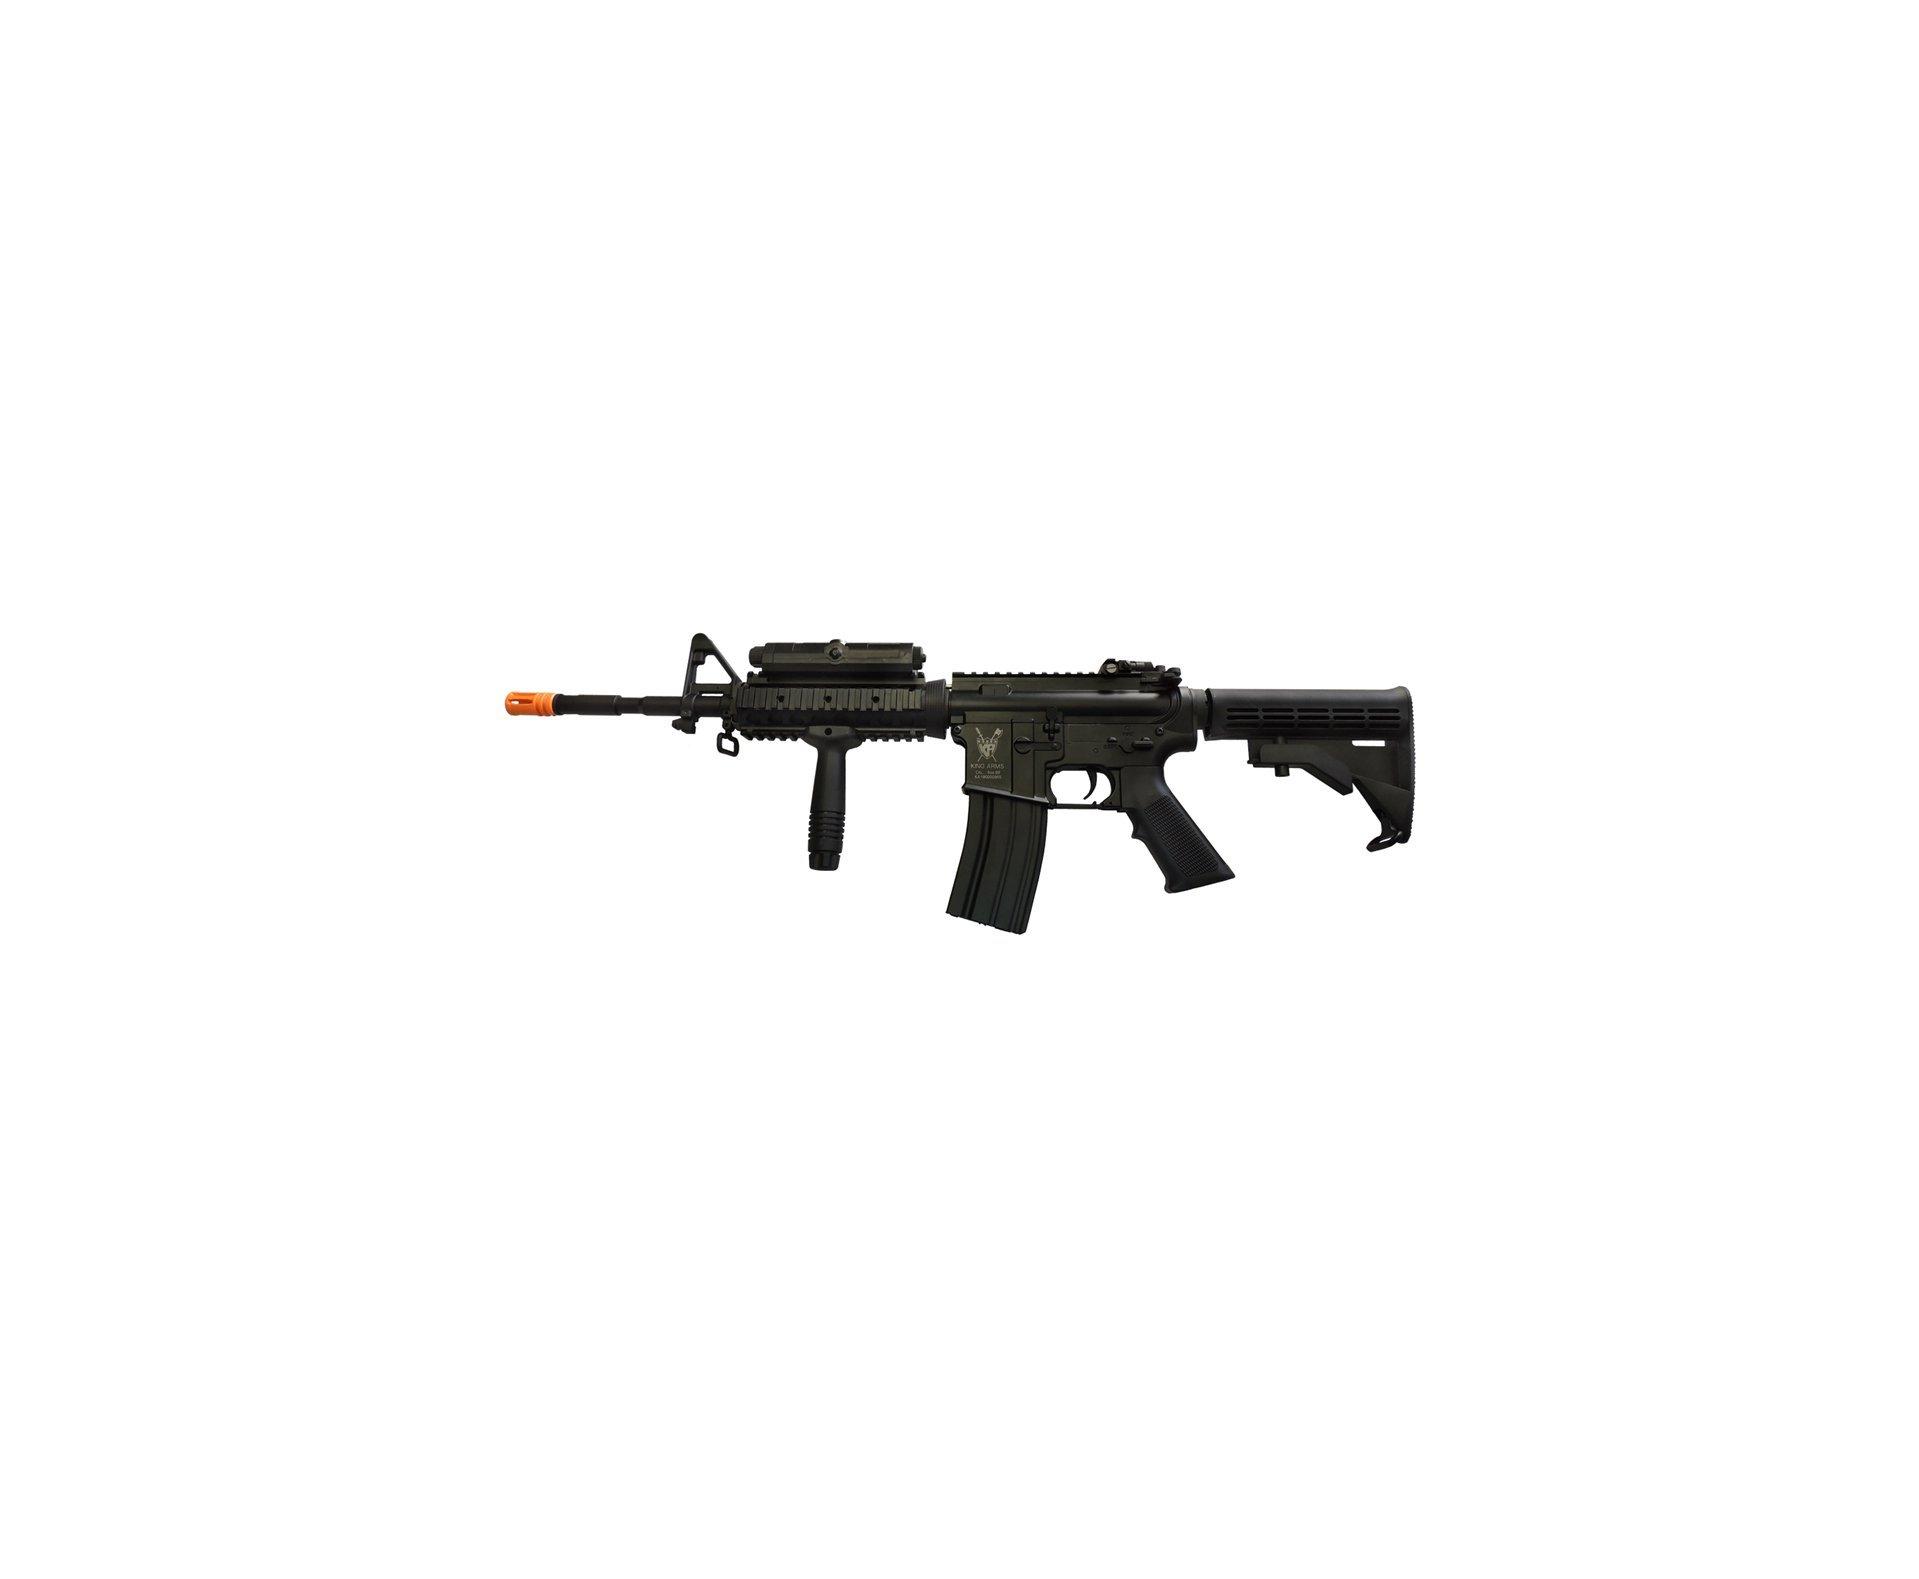 Rifle De Airsoft M4 Ris Advance Full Metal Cal 6.0mm - King Arms